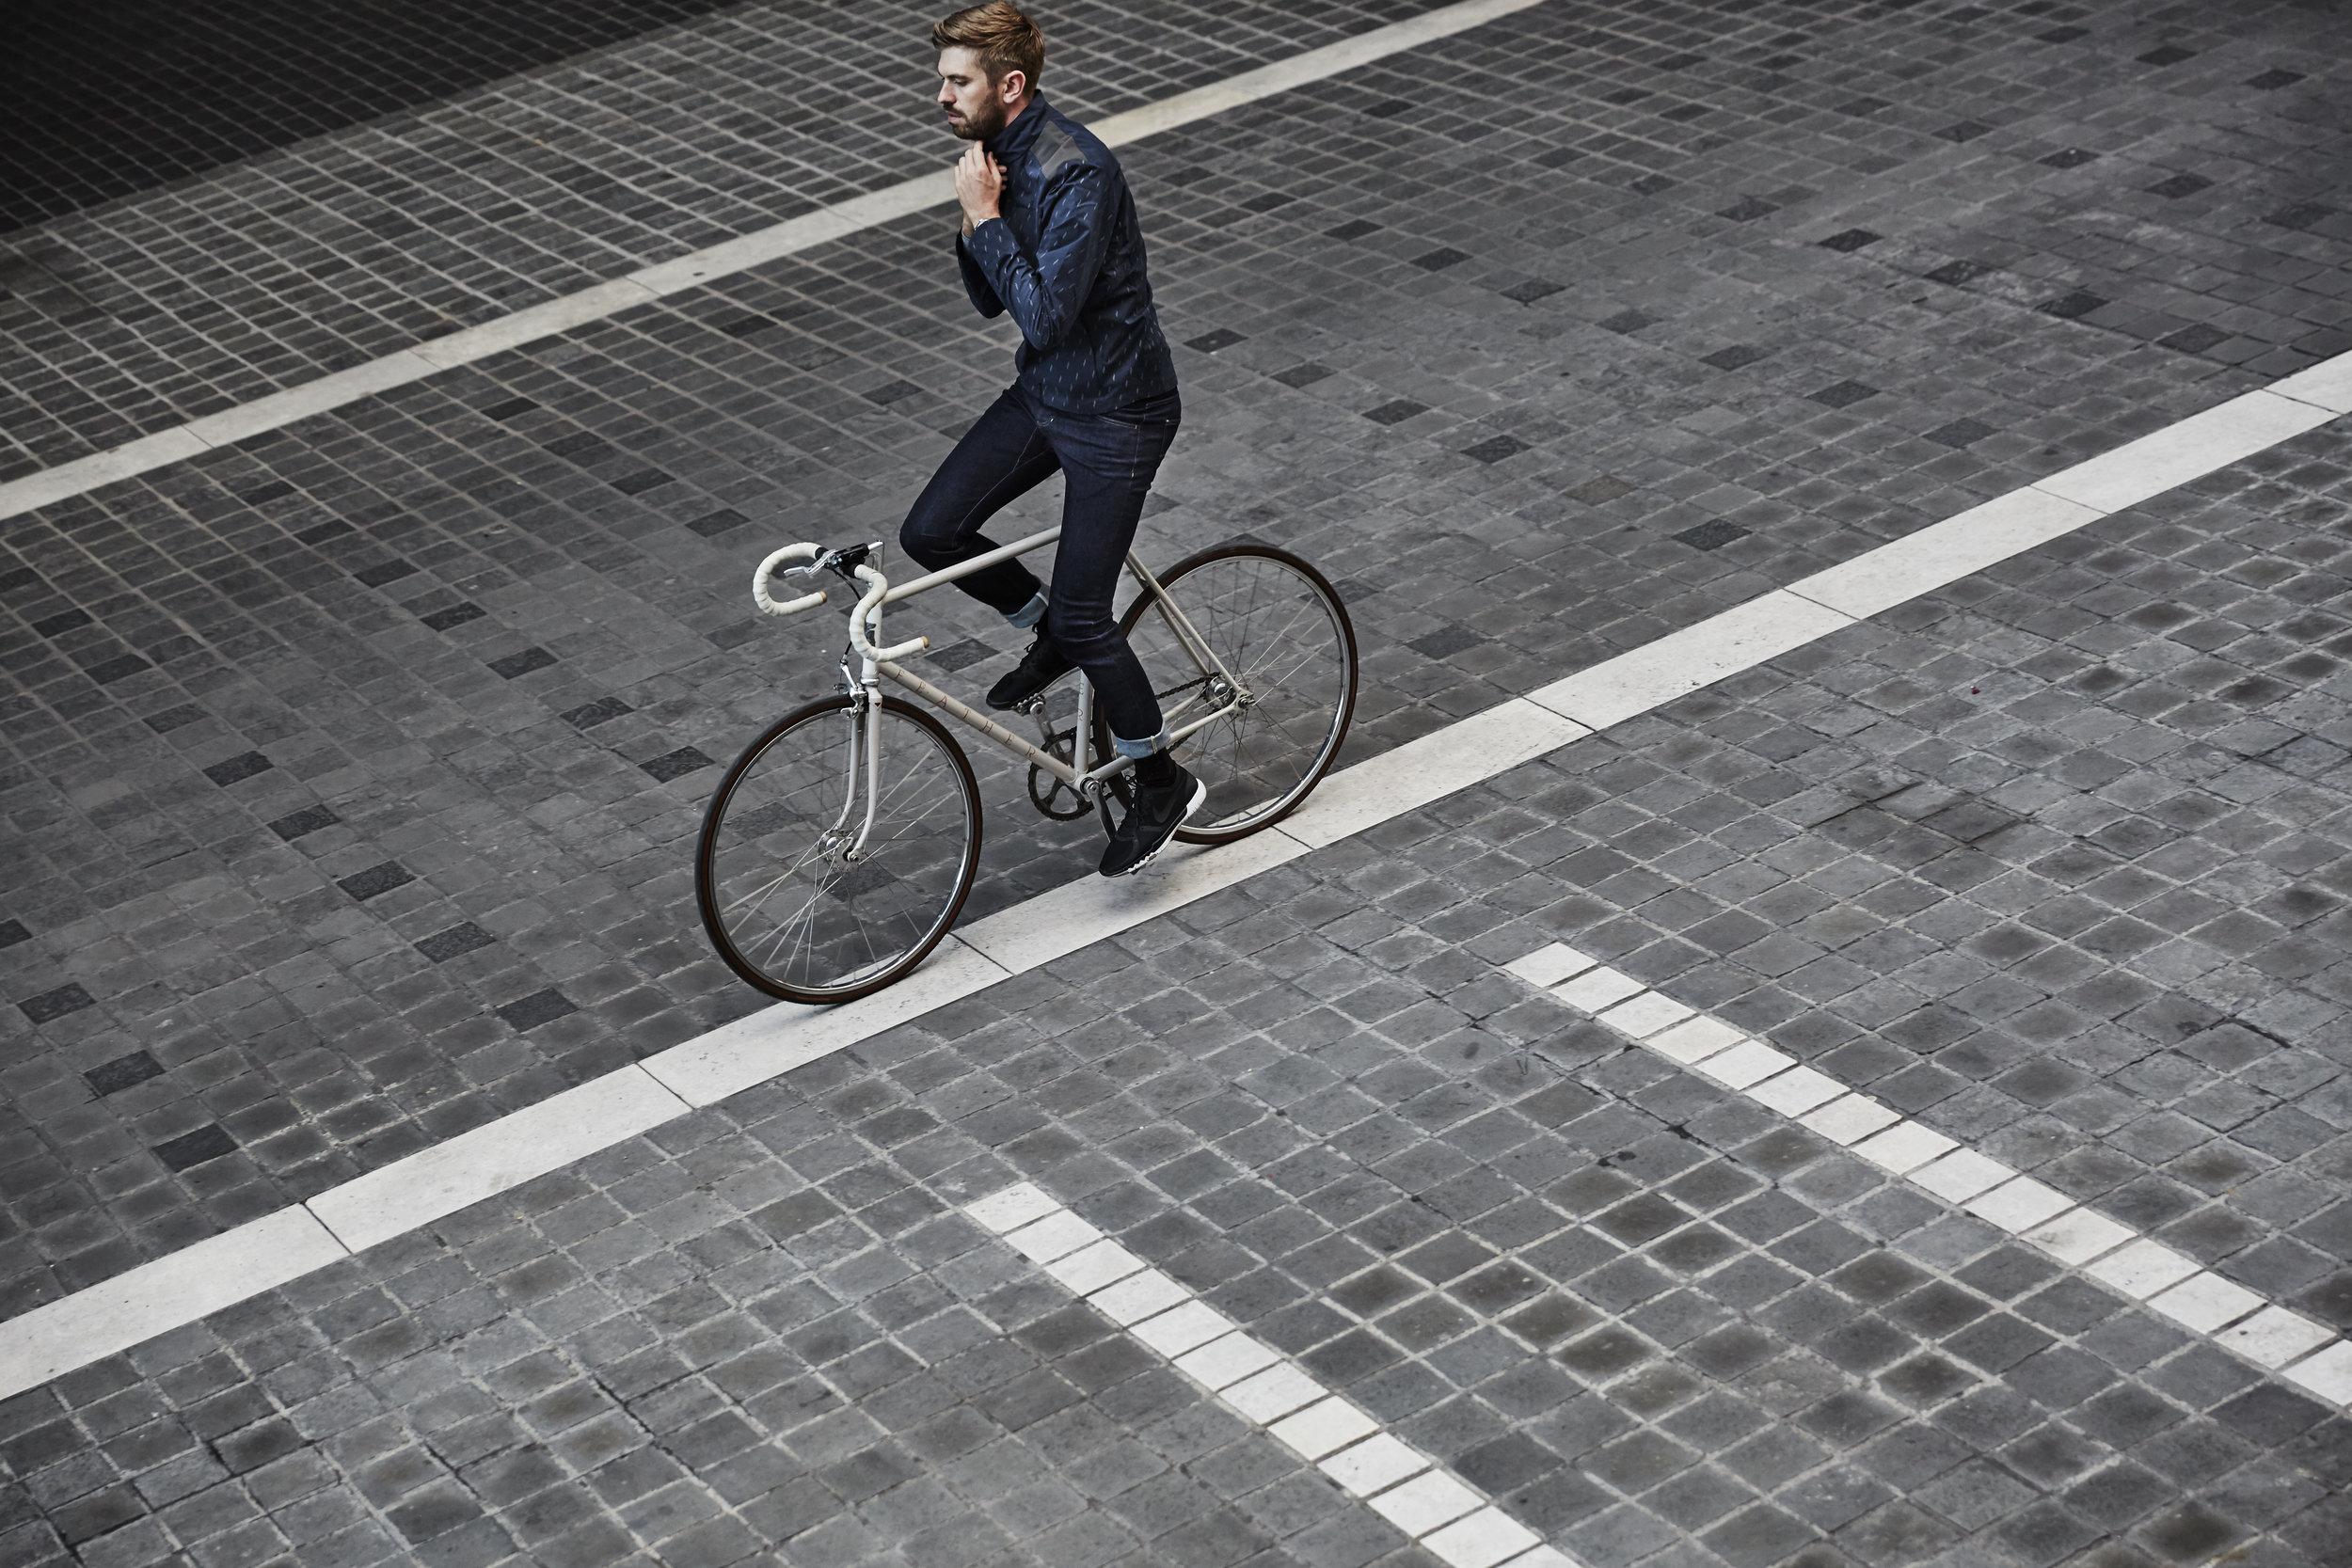 vulpine nick hussey cycling style apparel cool city urban commuter.jpg